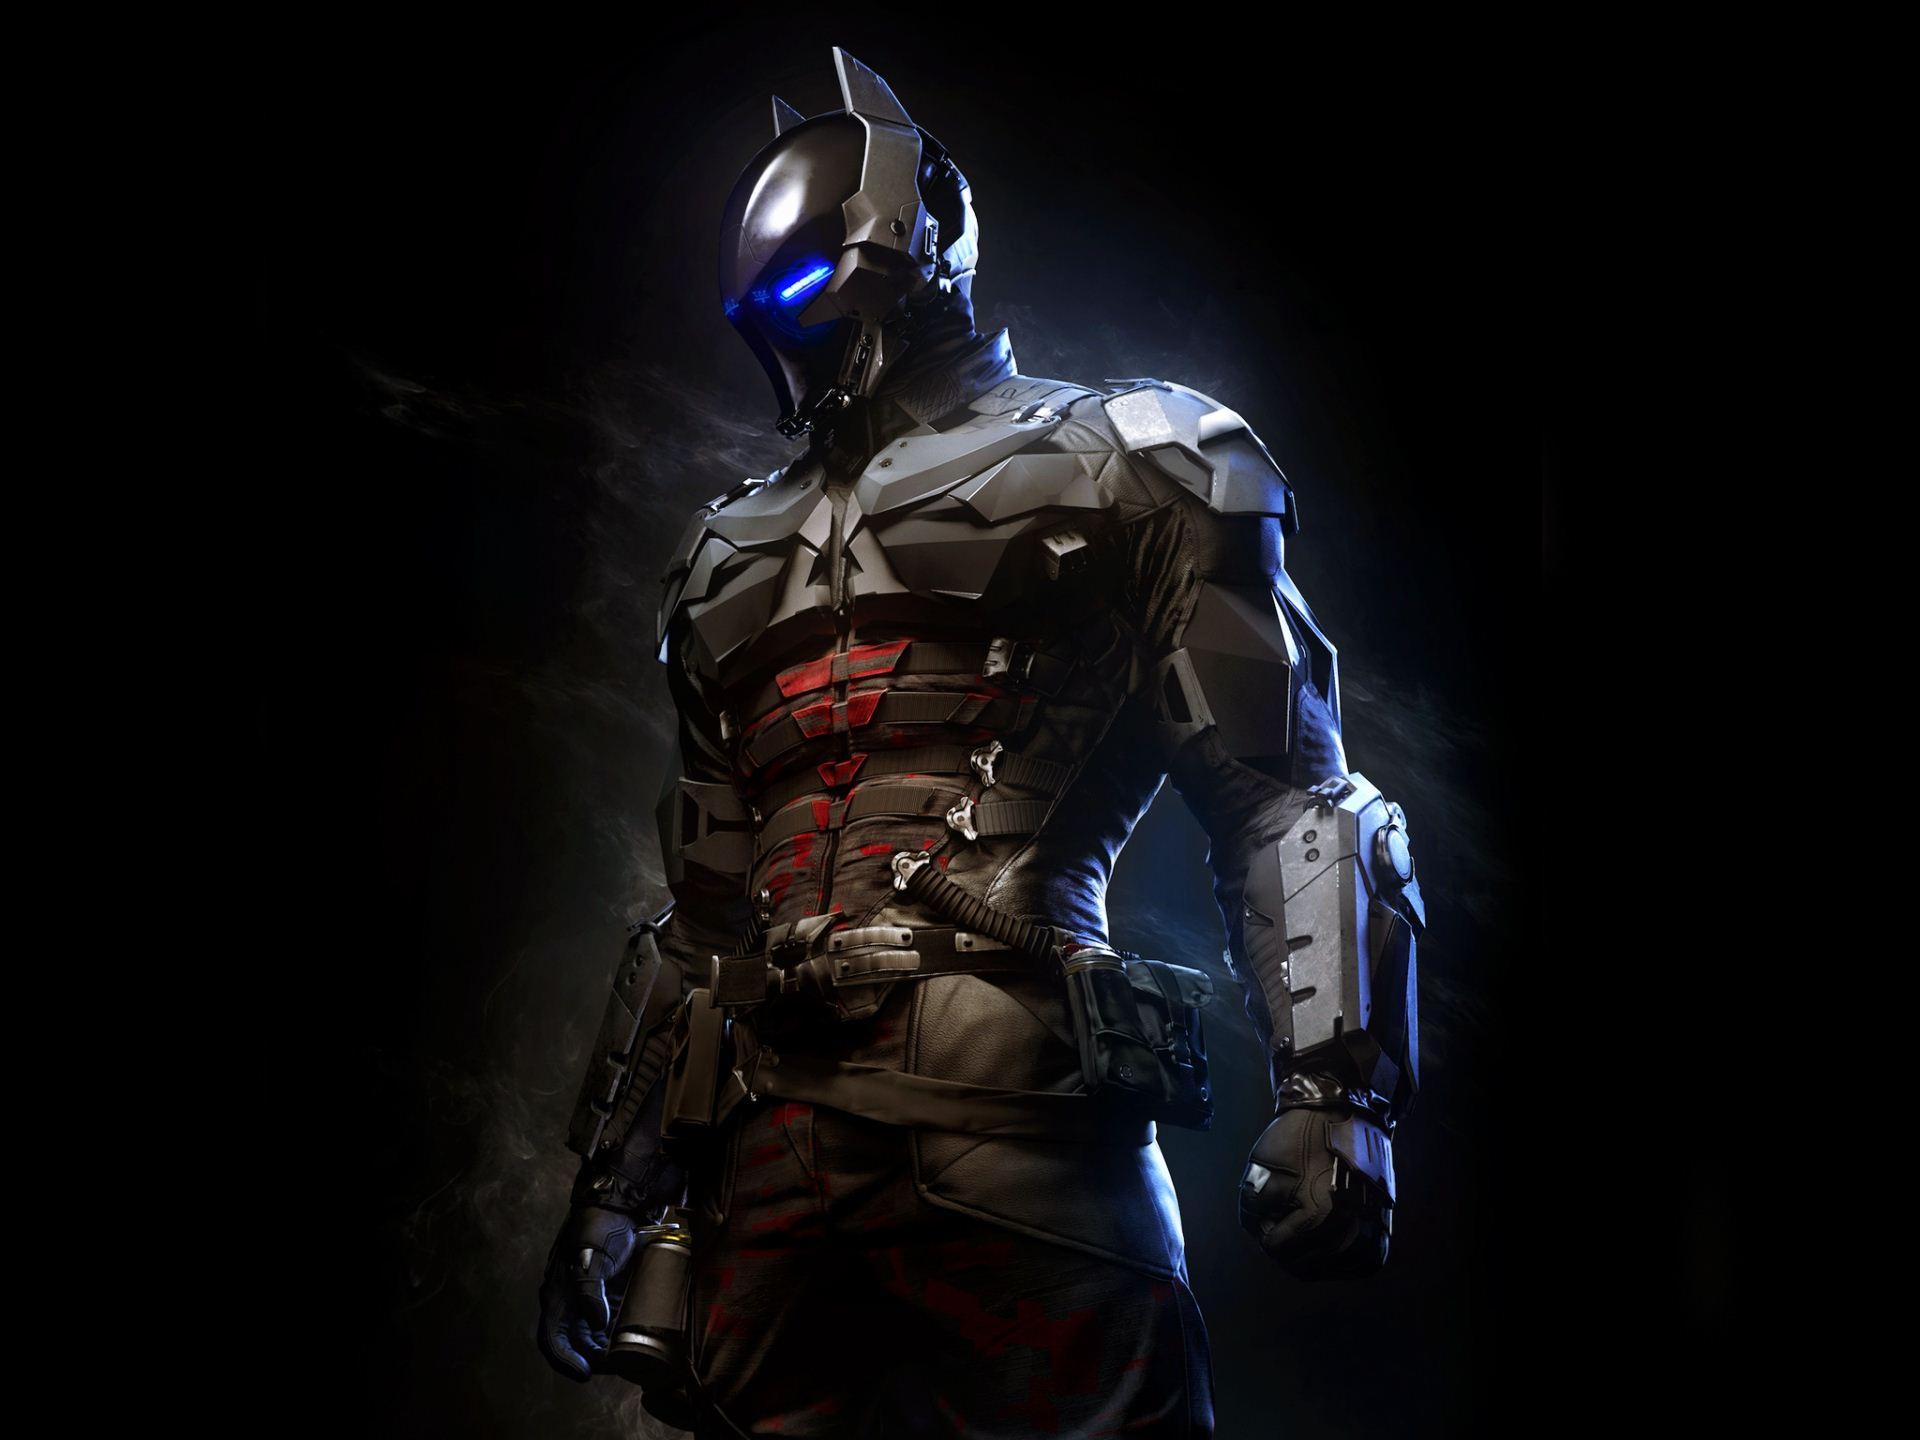 Batman: Arkham Knight Video Games 39 Cool Hd Wallpaper Wallpaper